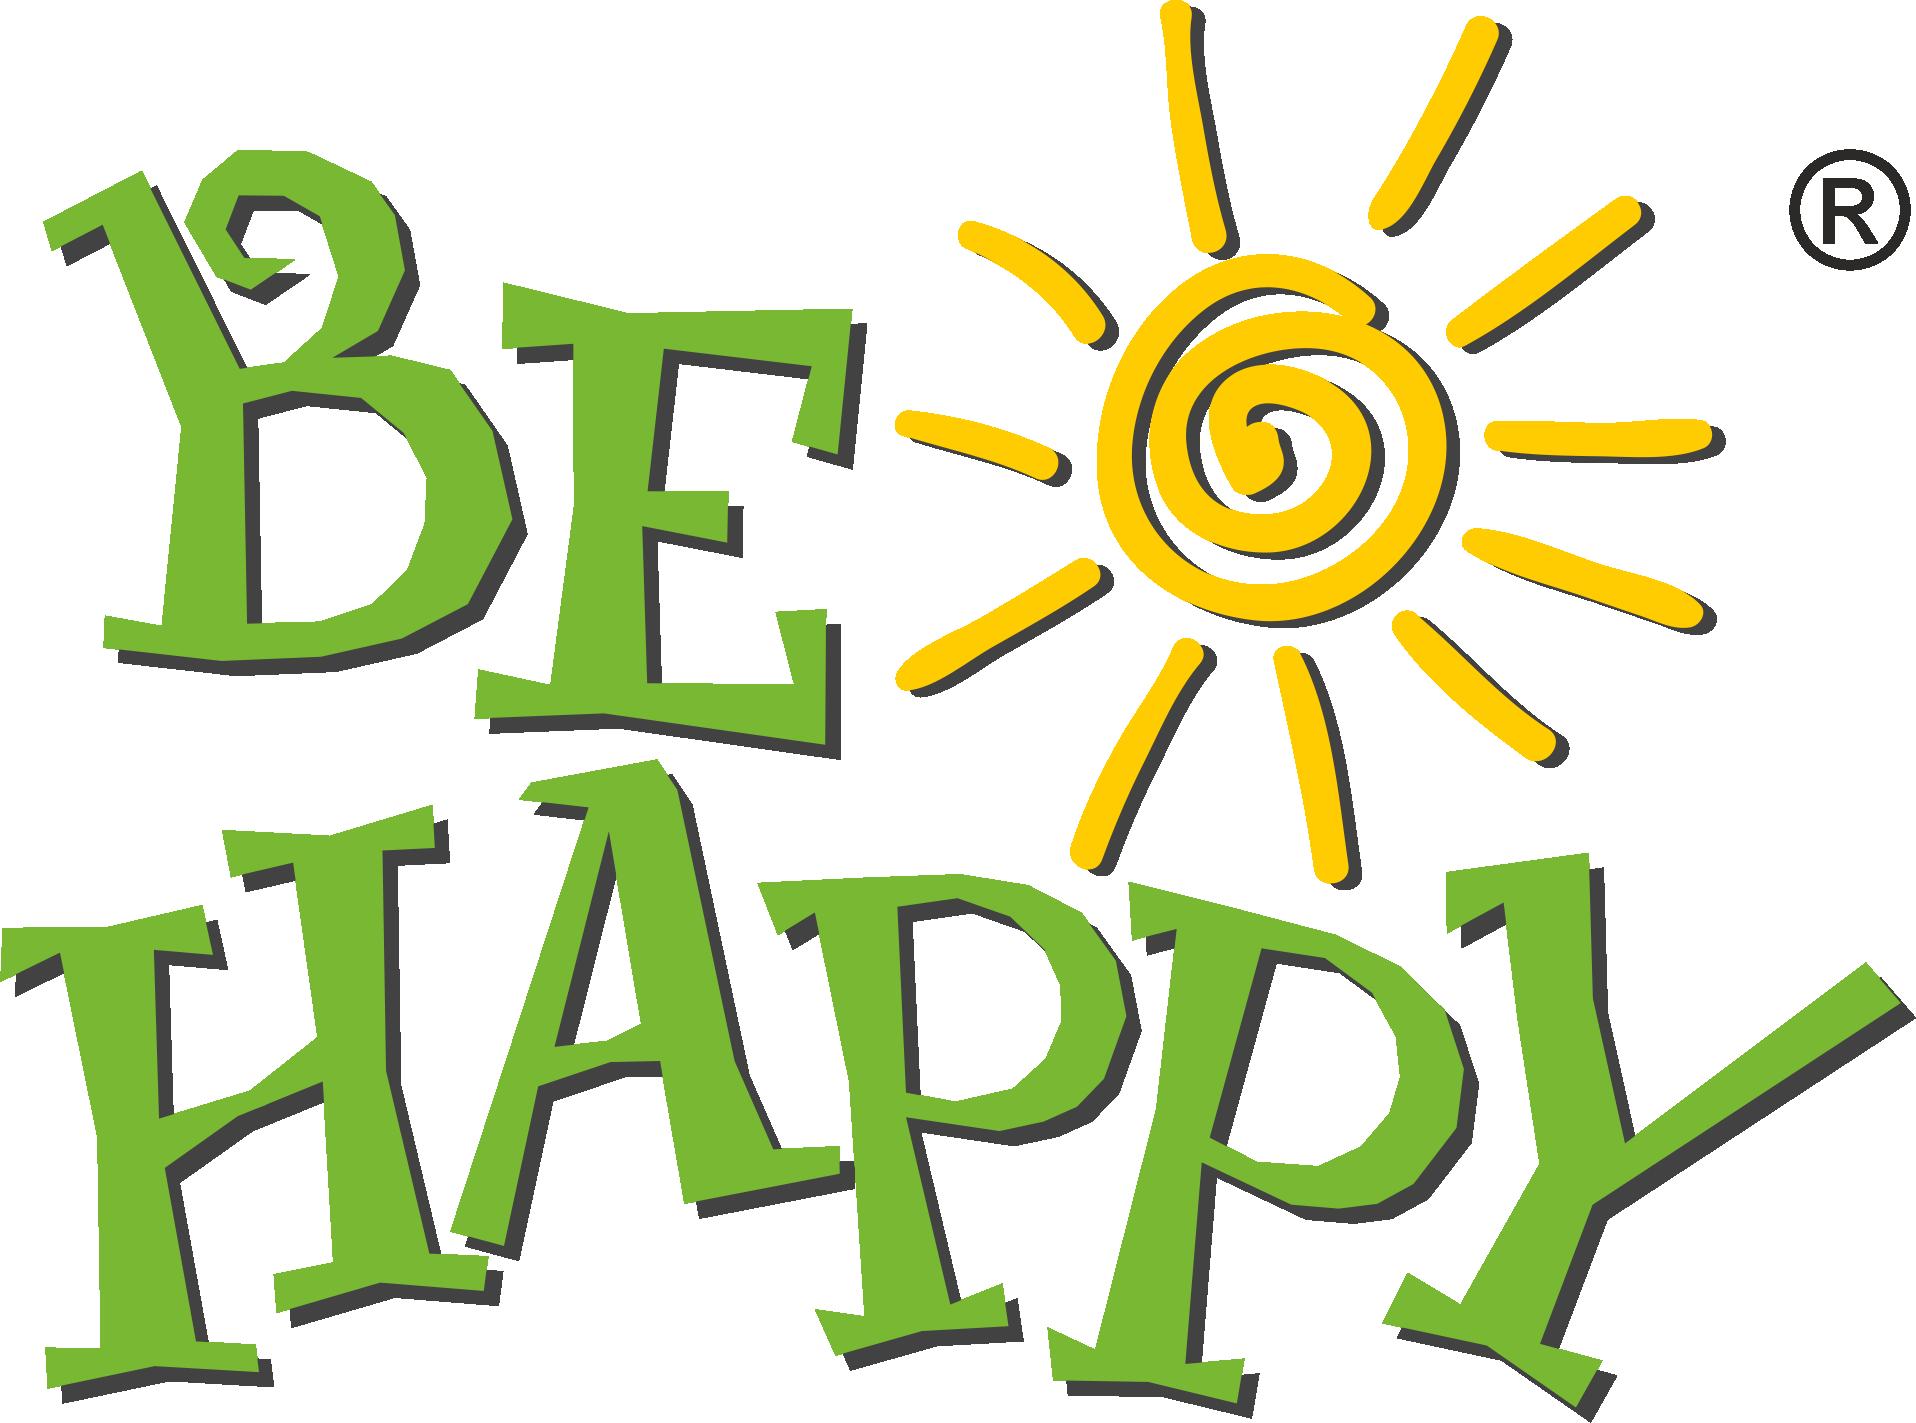 Kristallherz - Be Happy - Personalisierte Geschenke Großhandel